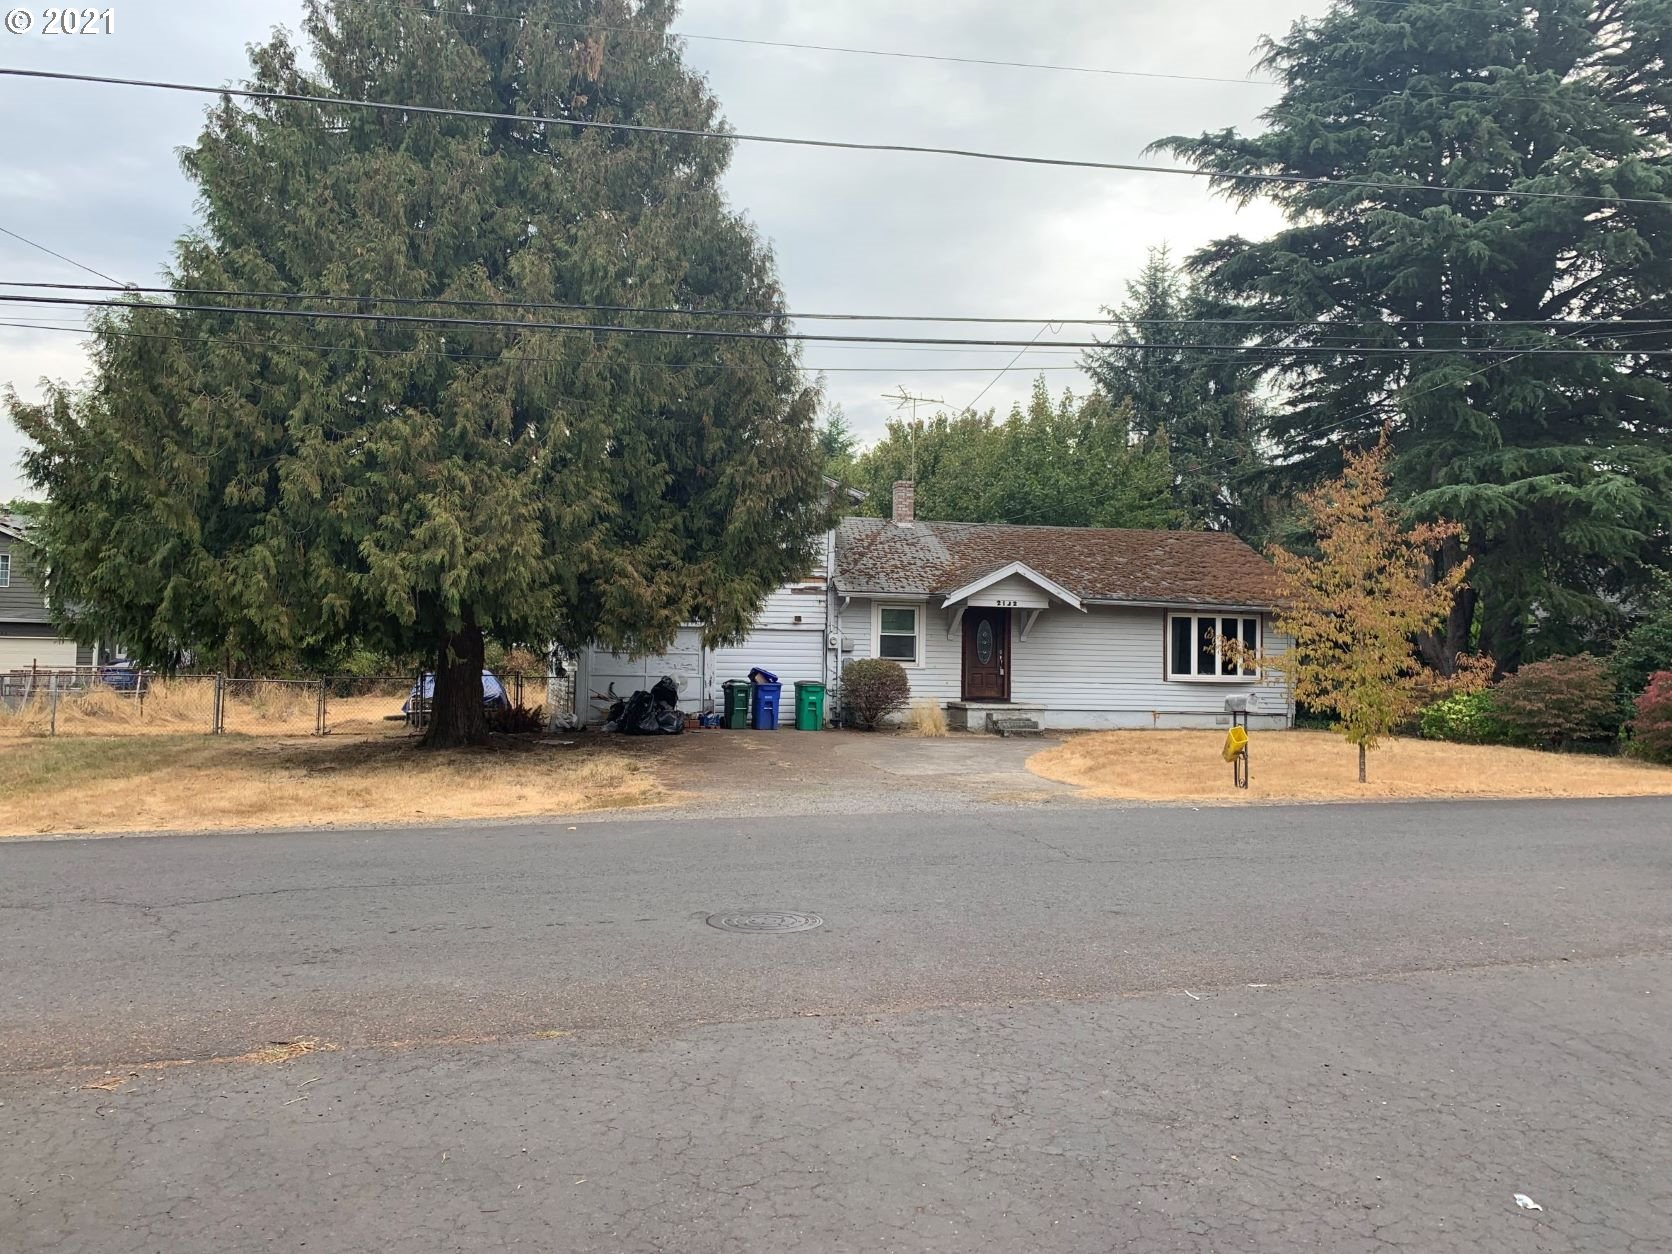 2132 SE 156TH AVE, Portland OR 97233